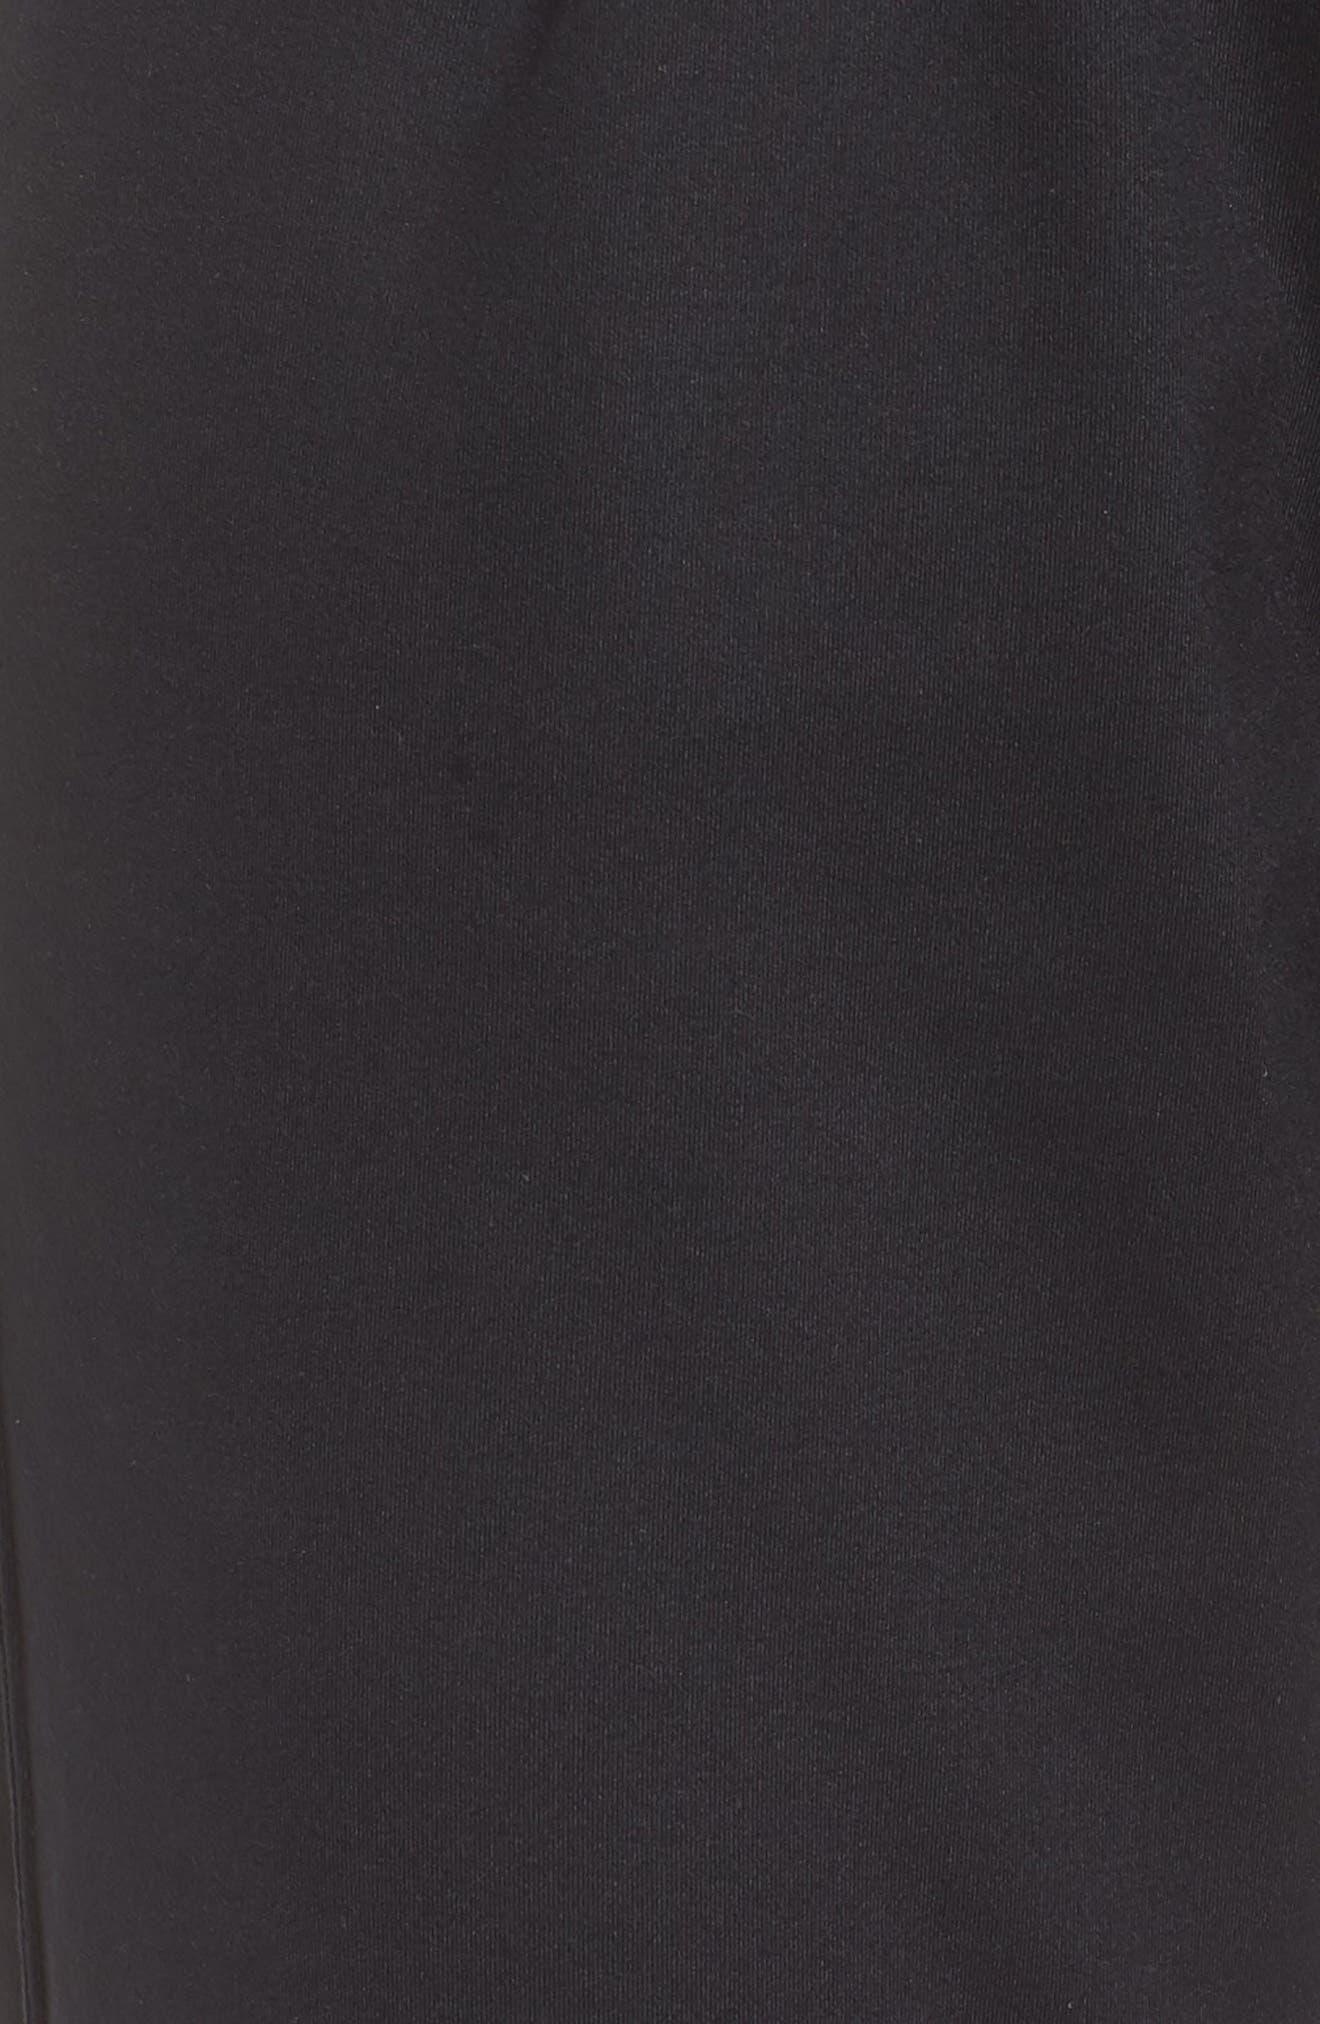 Taylor Slim Recycled Knit Jogger Pants,                             Alternate thumbnail 6, color,                             BLACK